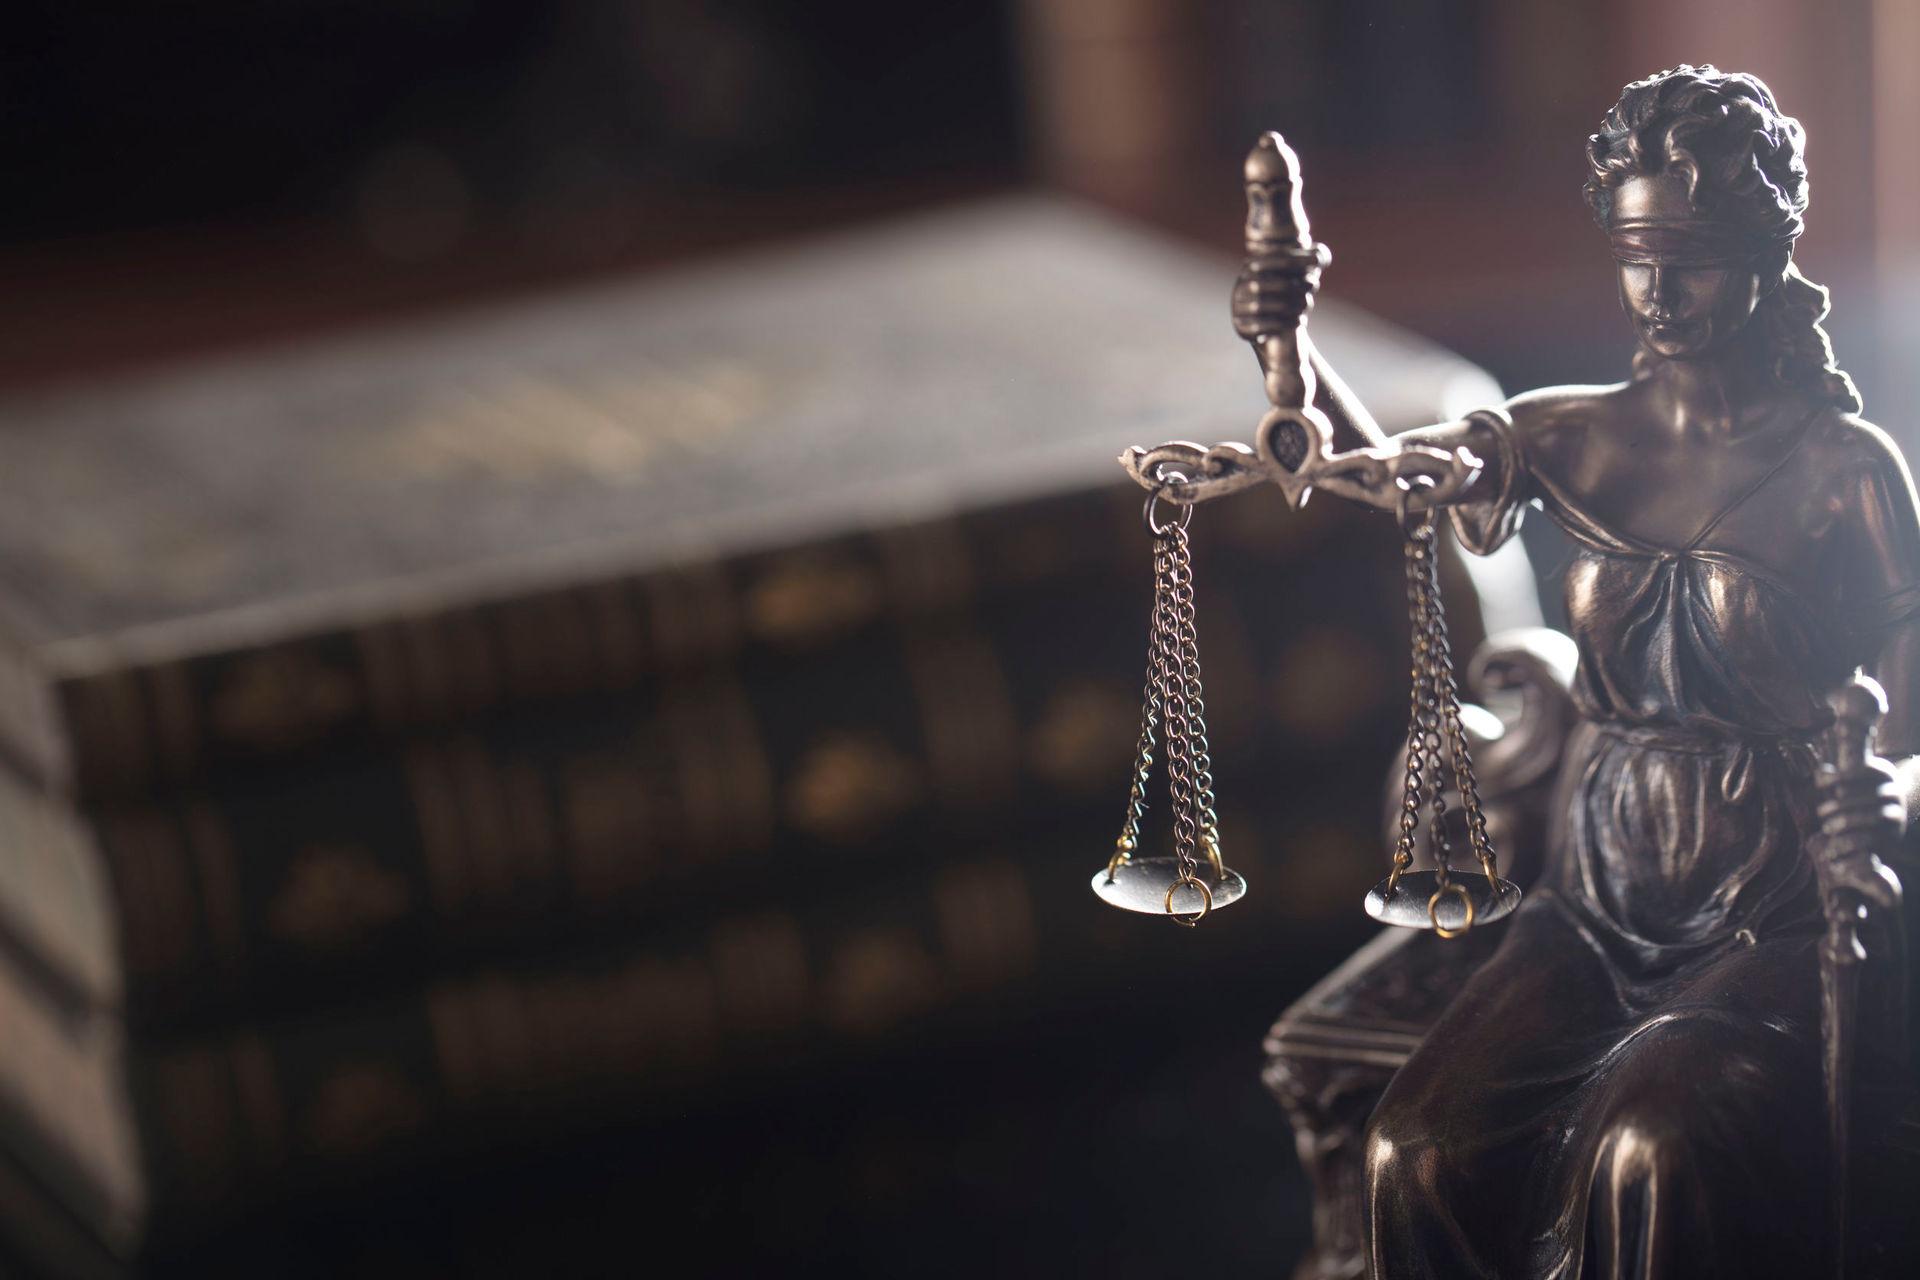 Lawsuit could make gunmaker open books